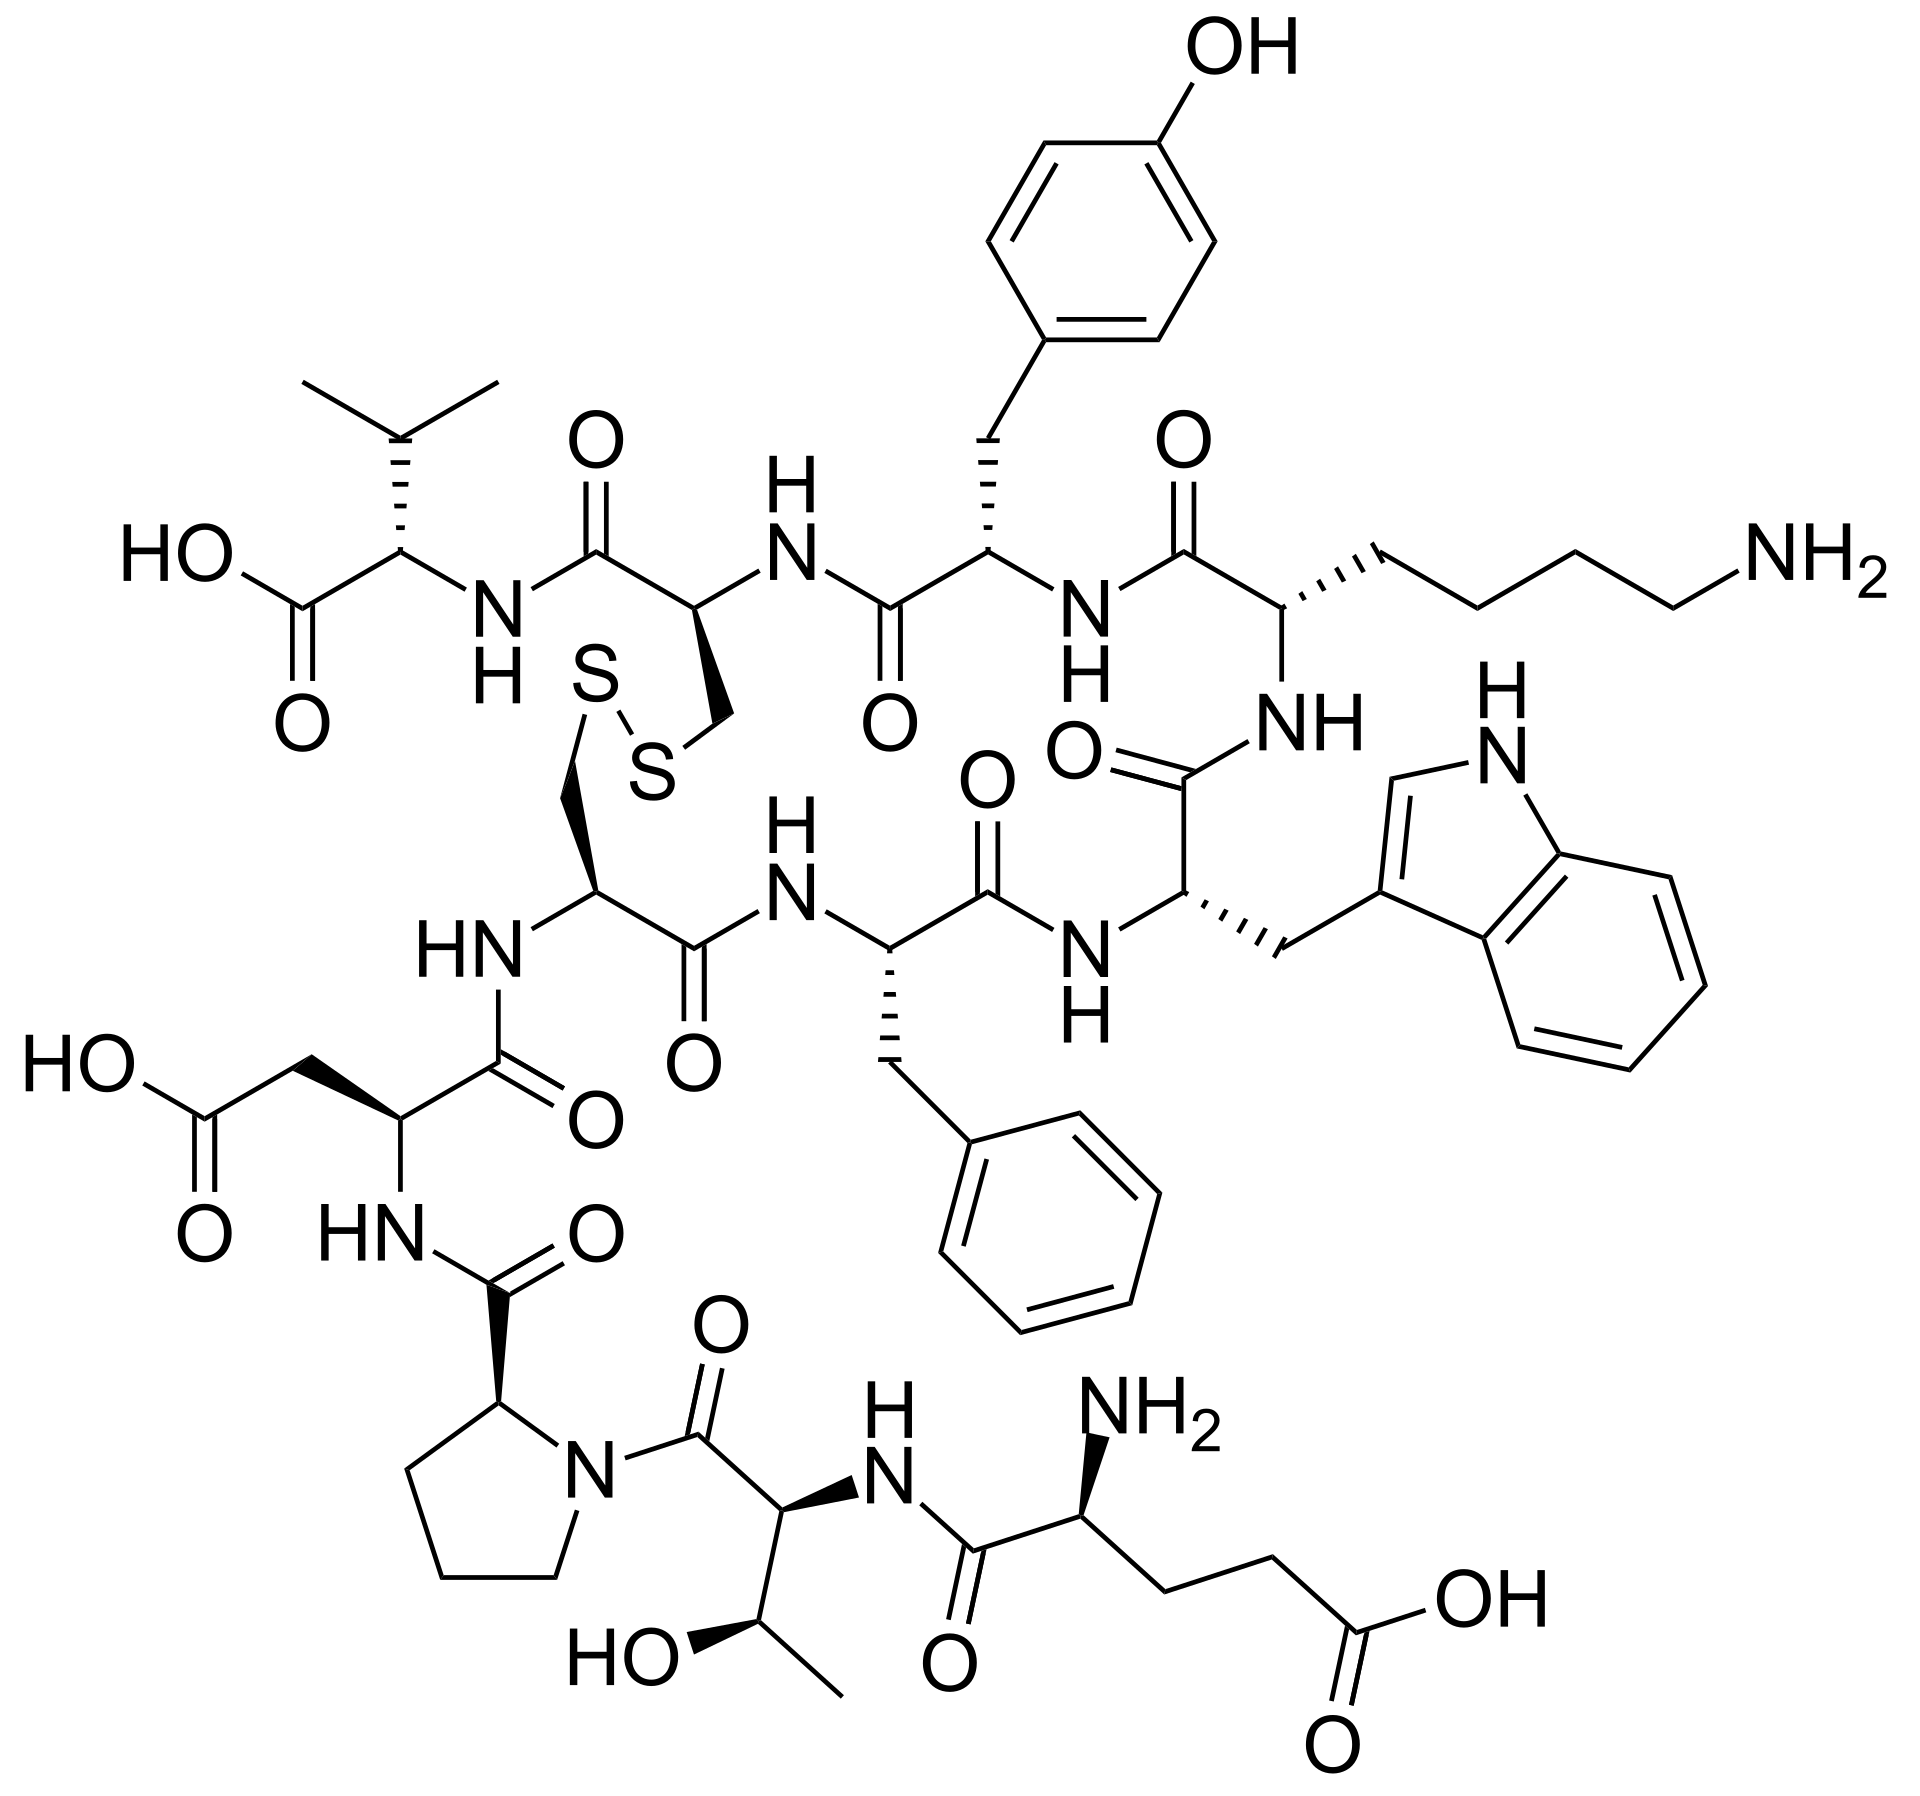 urotensin II human